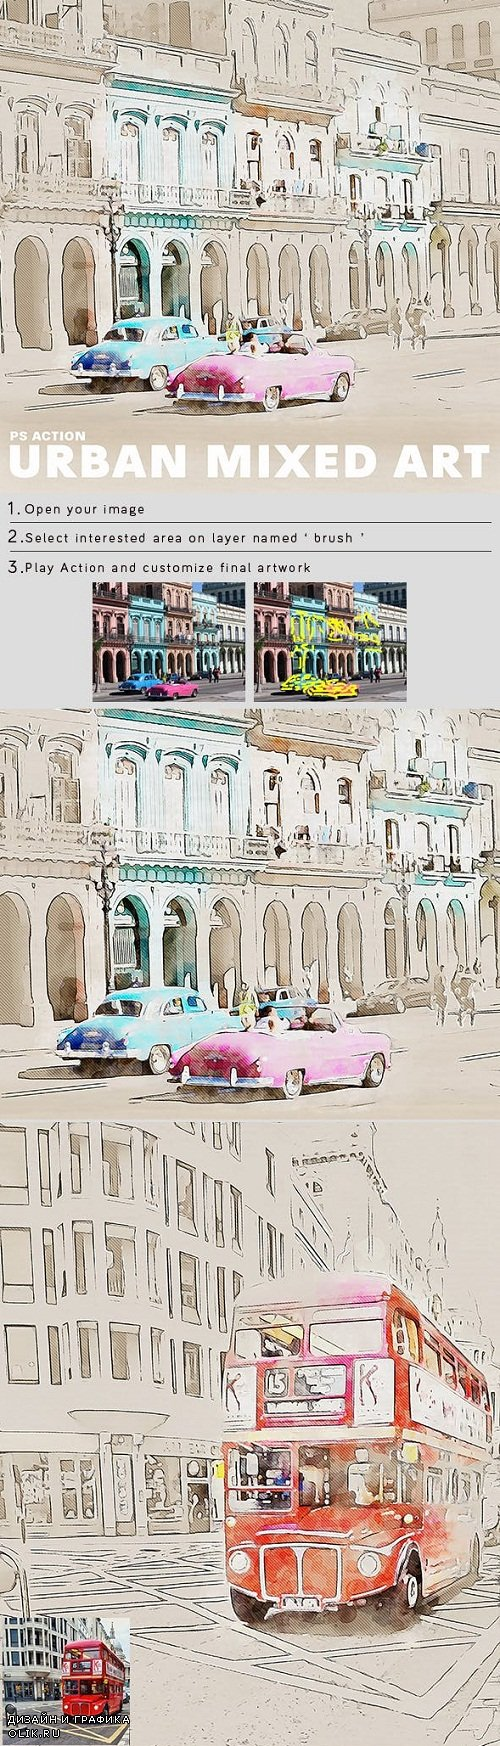 Urban Mixed Art Photoshop Action 23450366